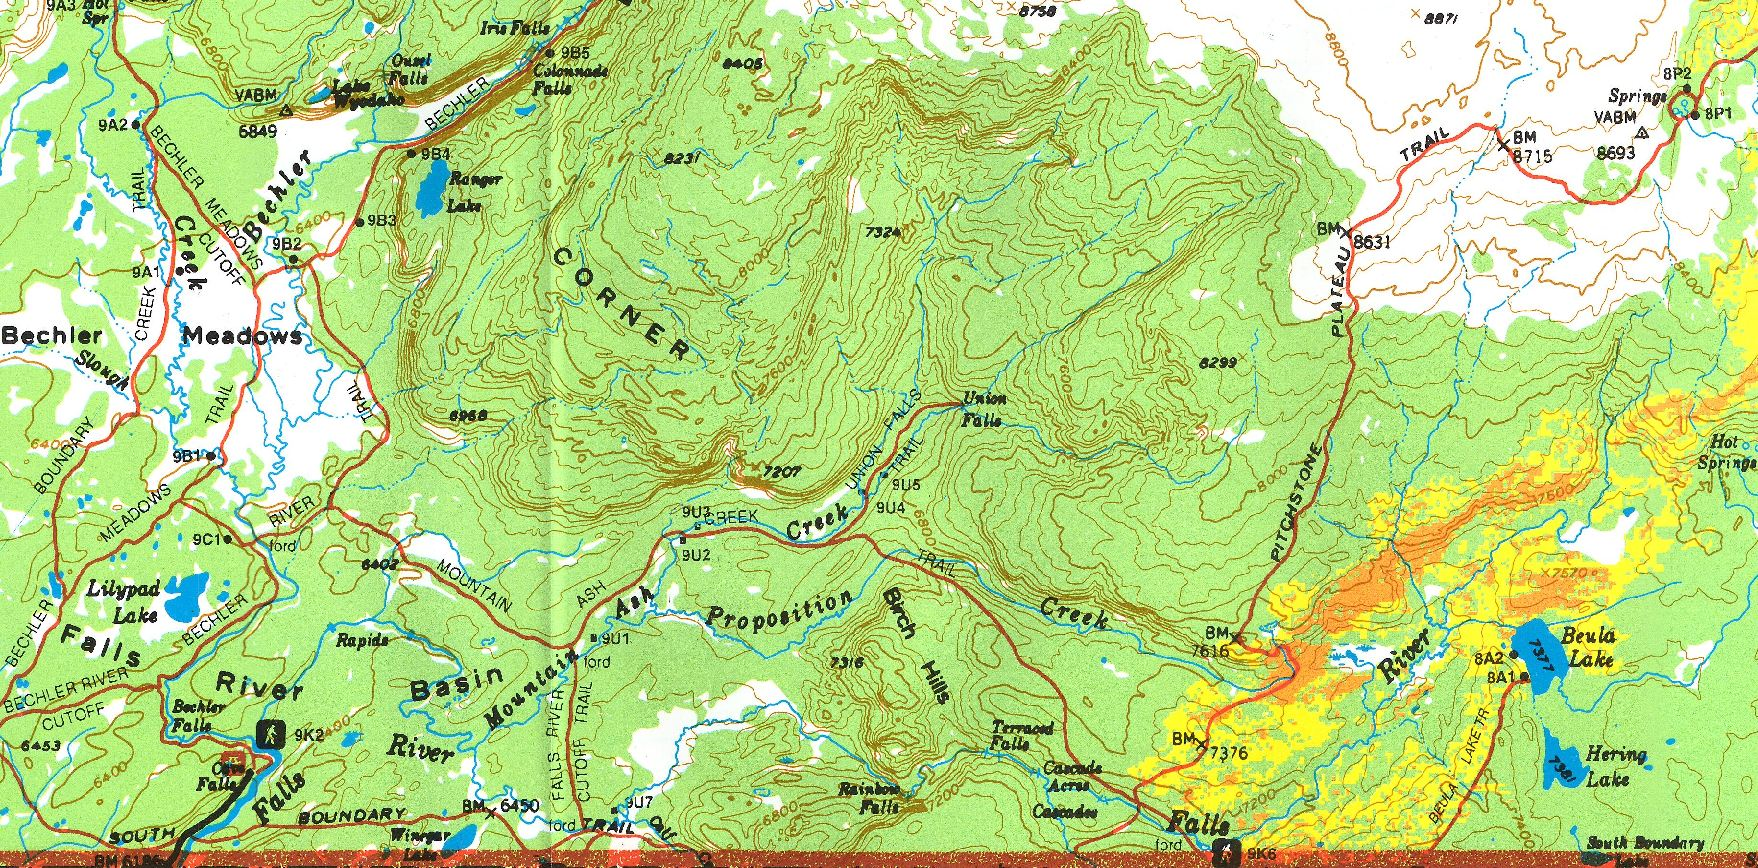 Yellowstone map.JPG